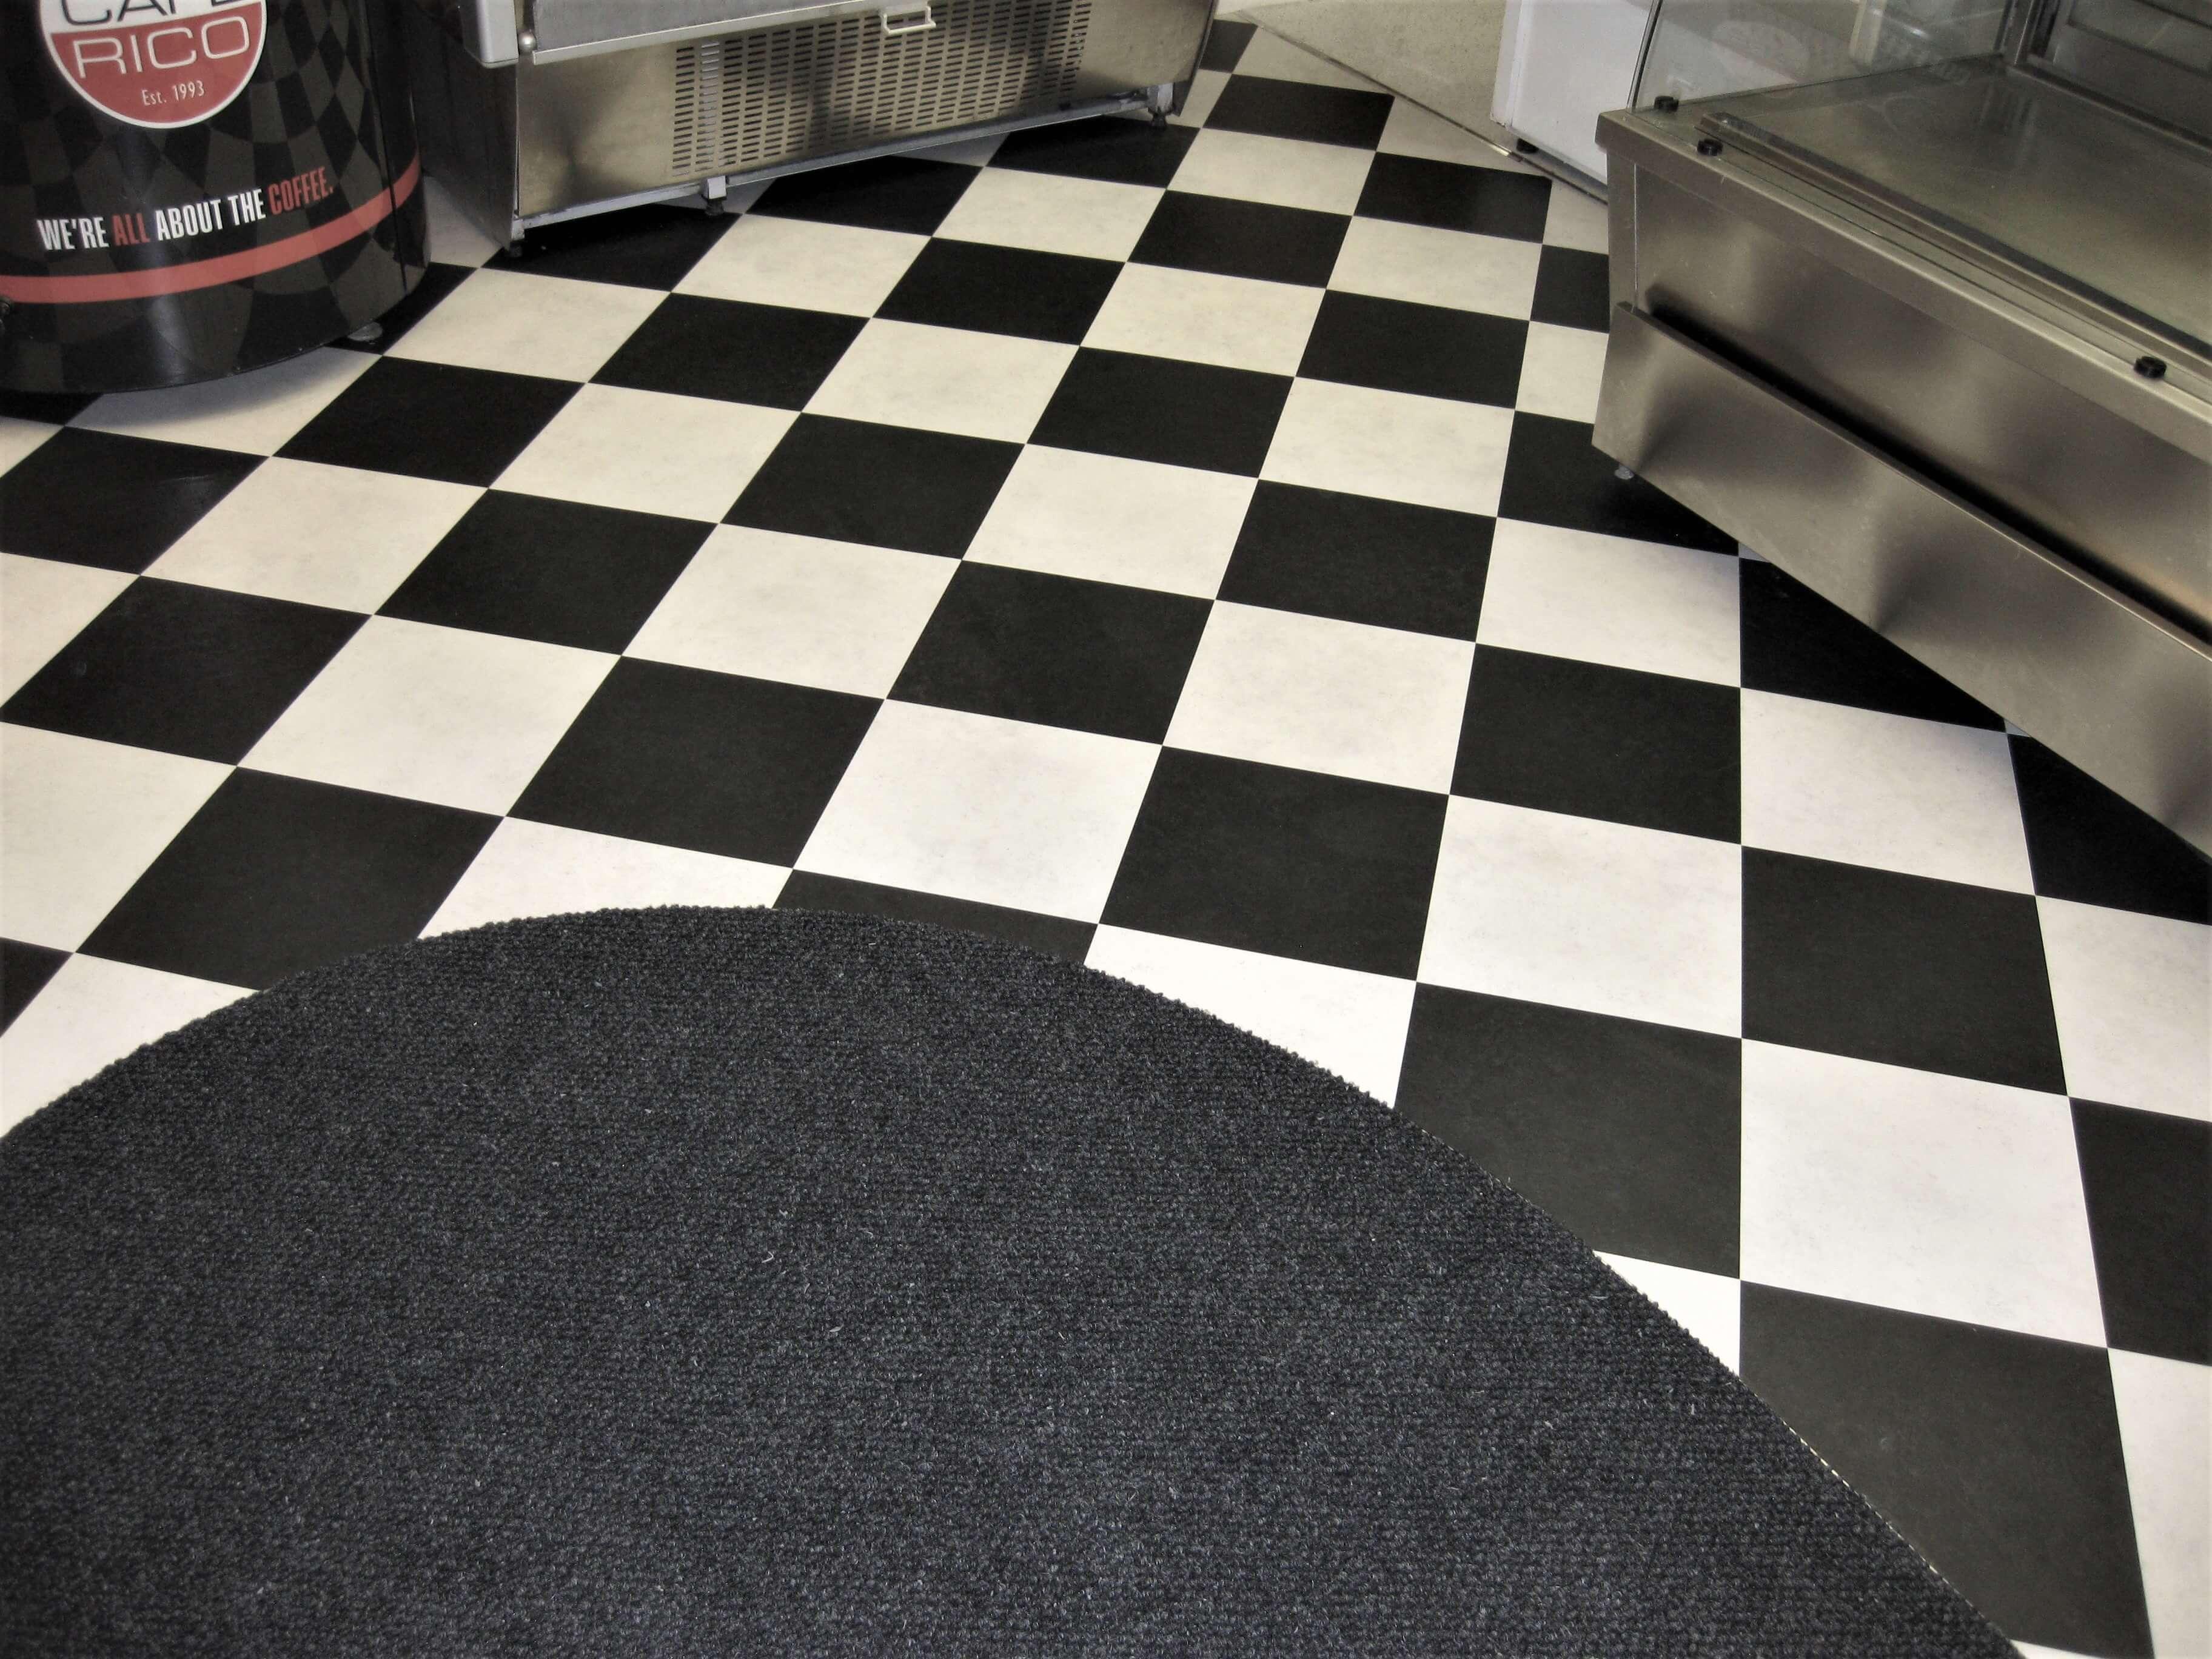 Commercial shop flooring